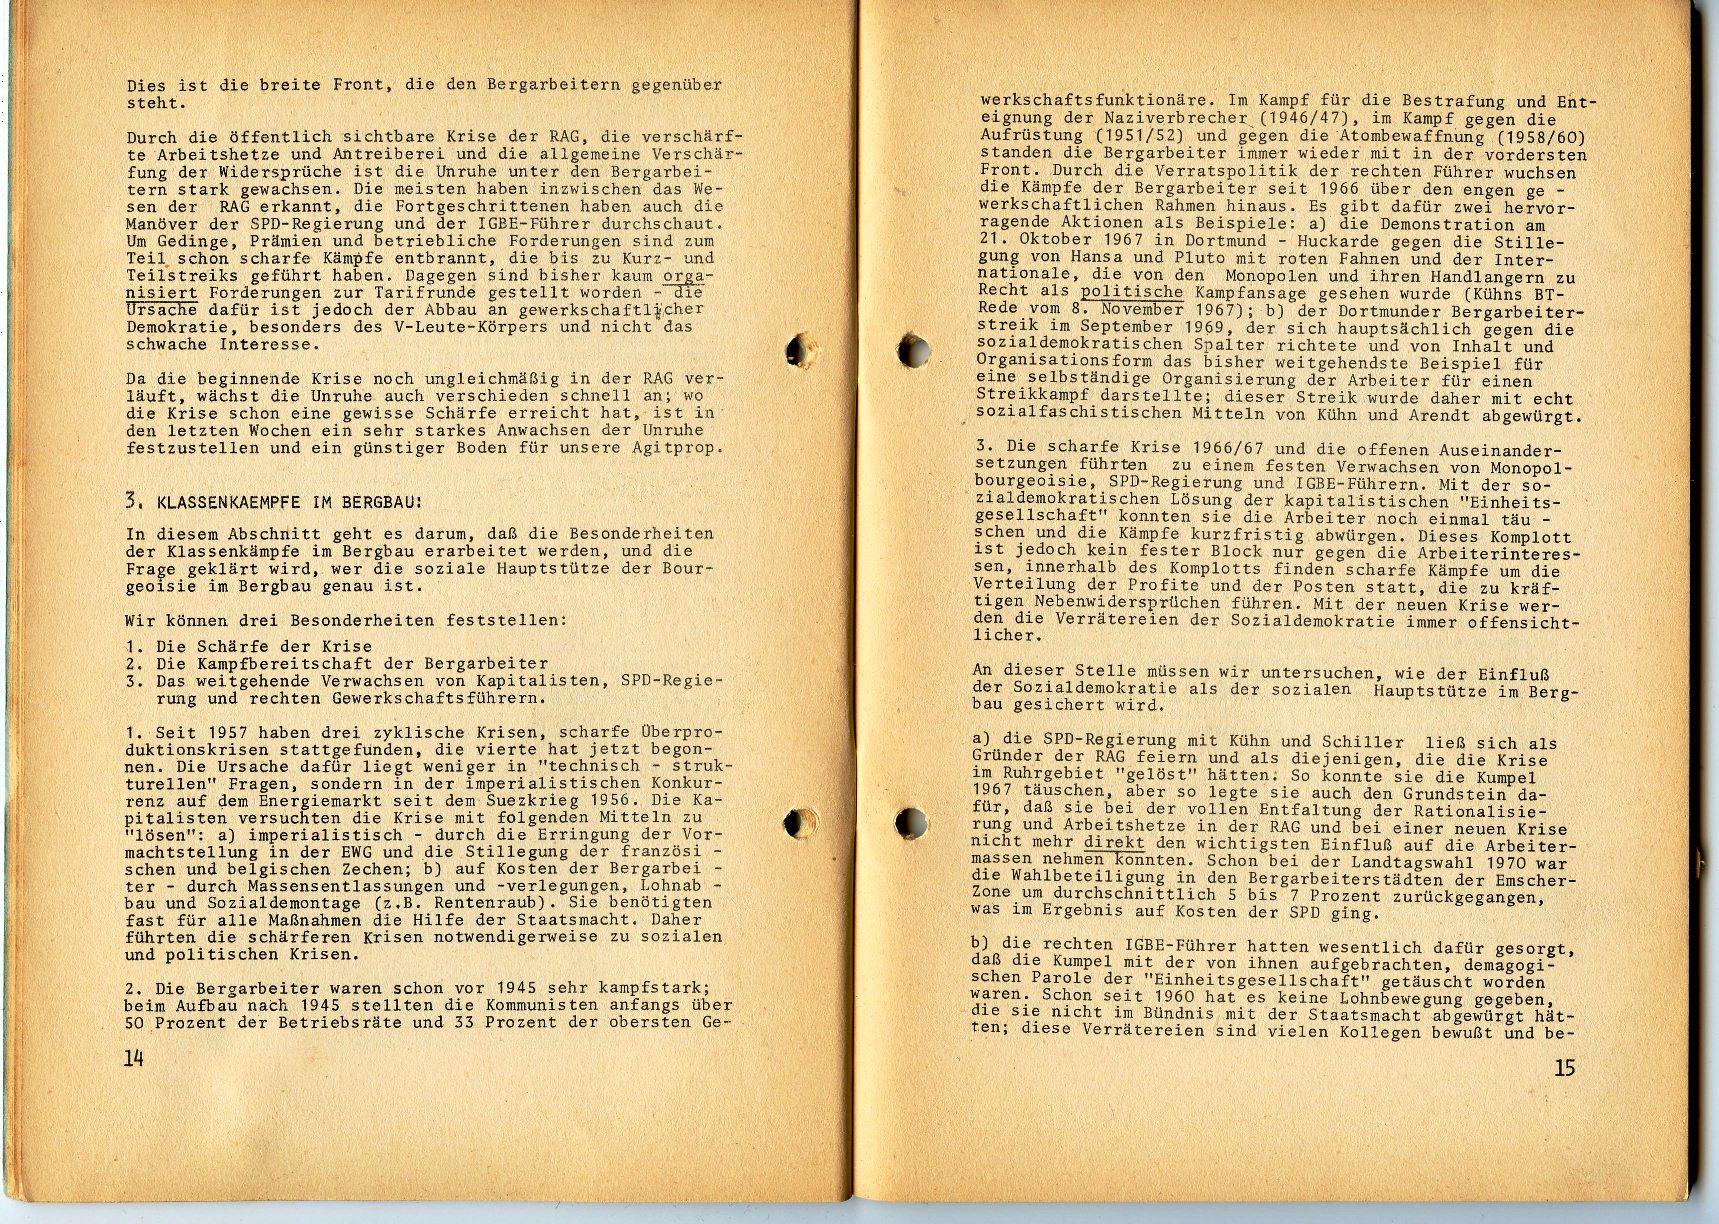 ZB_Parteiarbeiter_1971_04_08